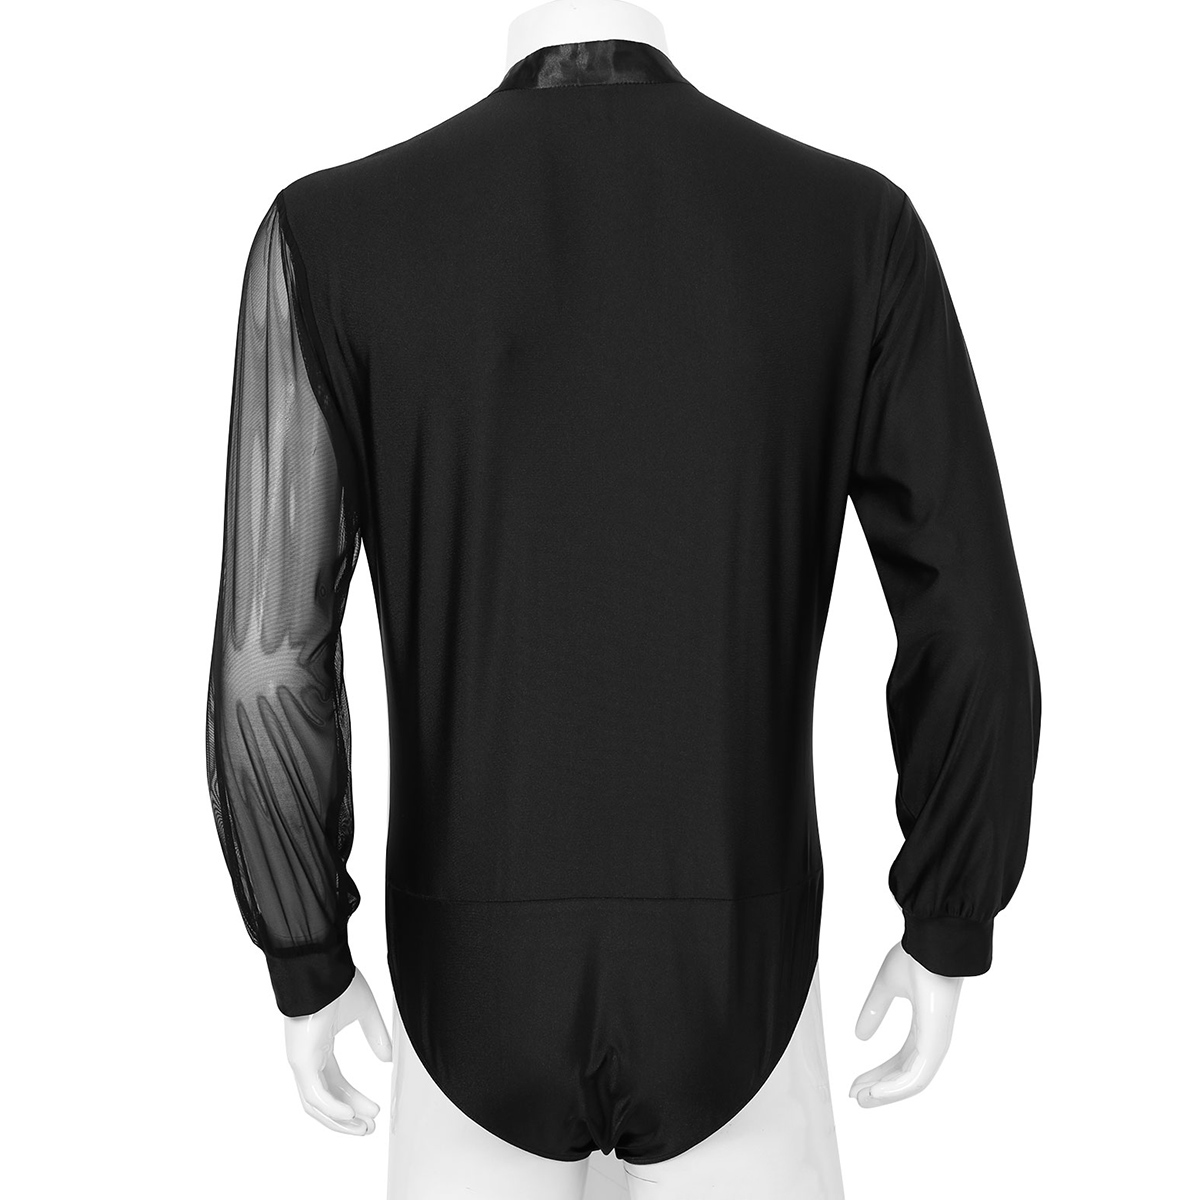 iiniim Mens Long Sleeve Shiny Rhinestones Latin Dance Shirt Leotard Bodysuit Dancewear